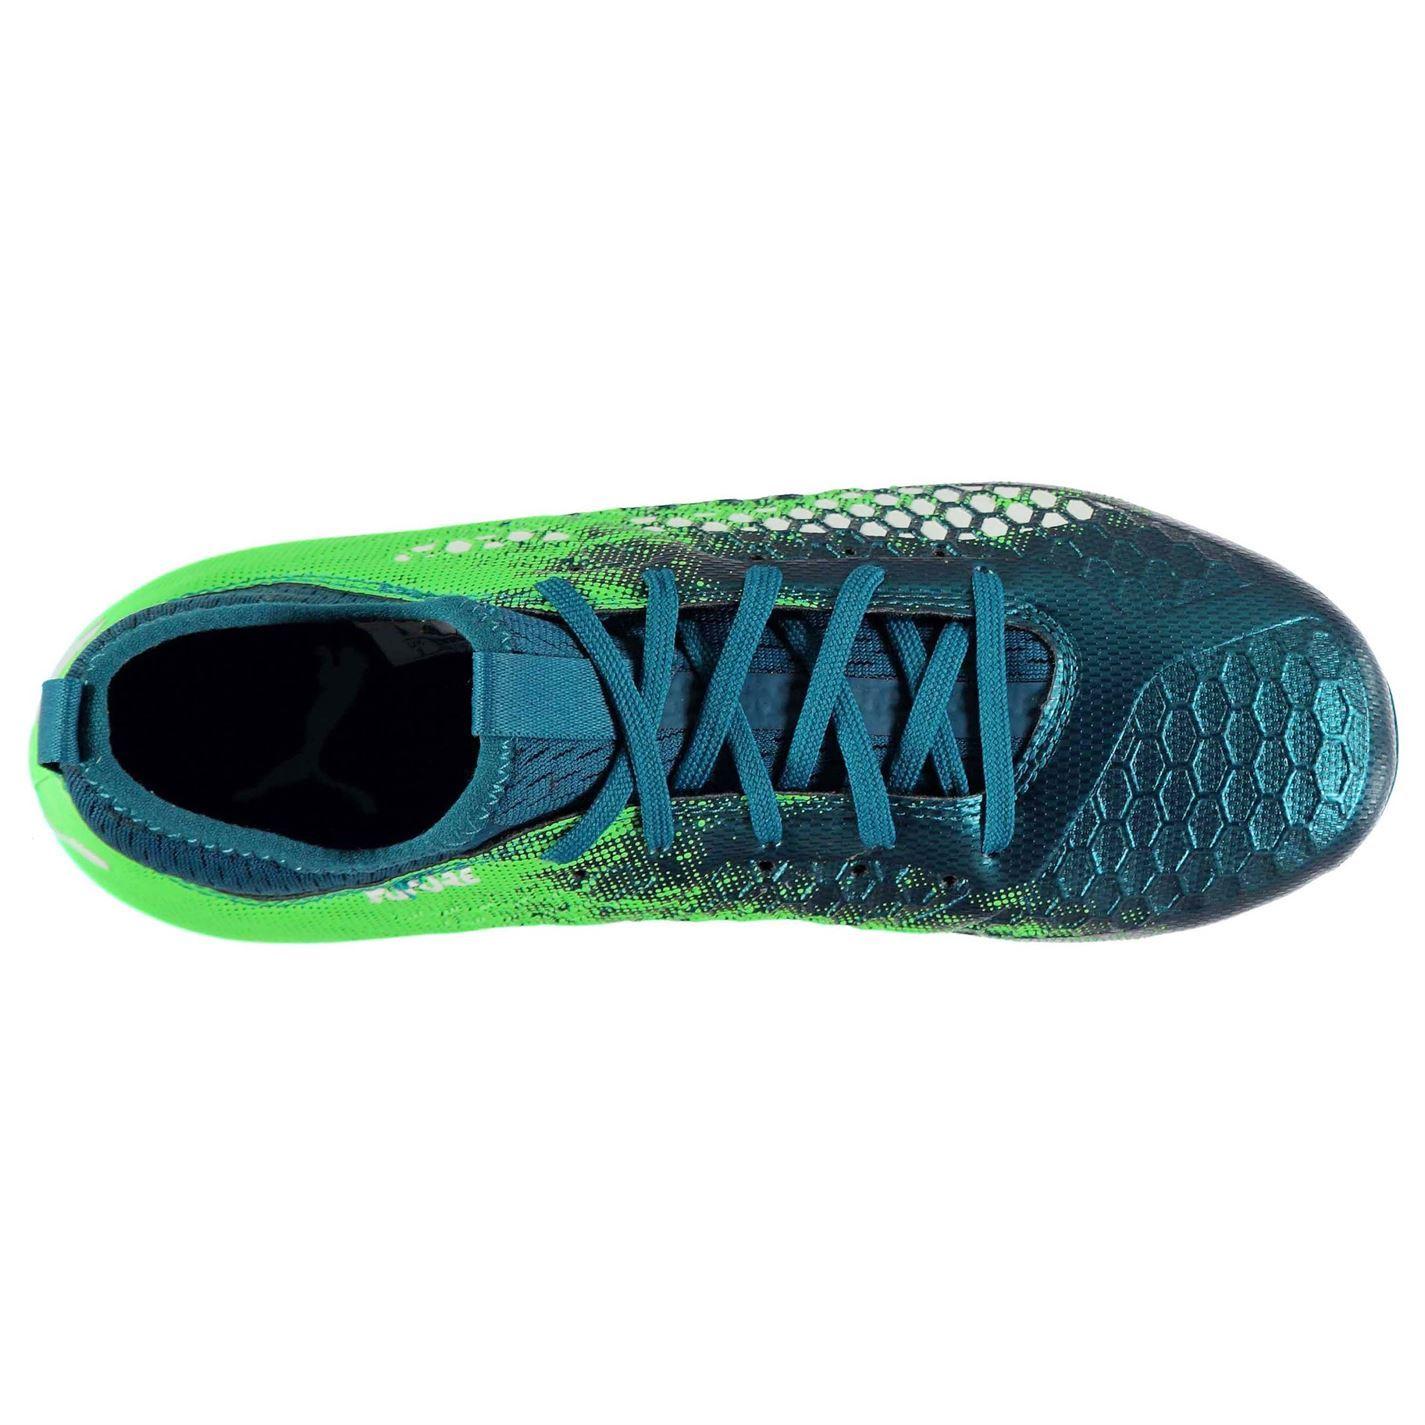 Detalles de Puma Future 19.3 Firme Suelo Fg Zapatillas de Fútbol Hombre Tacos Calzado